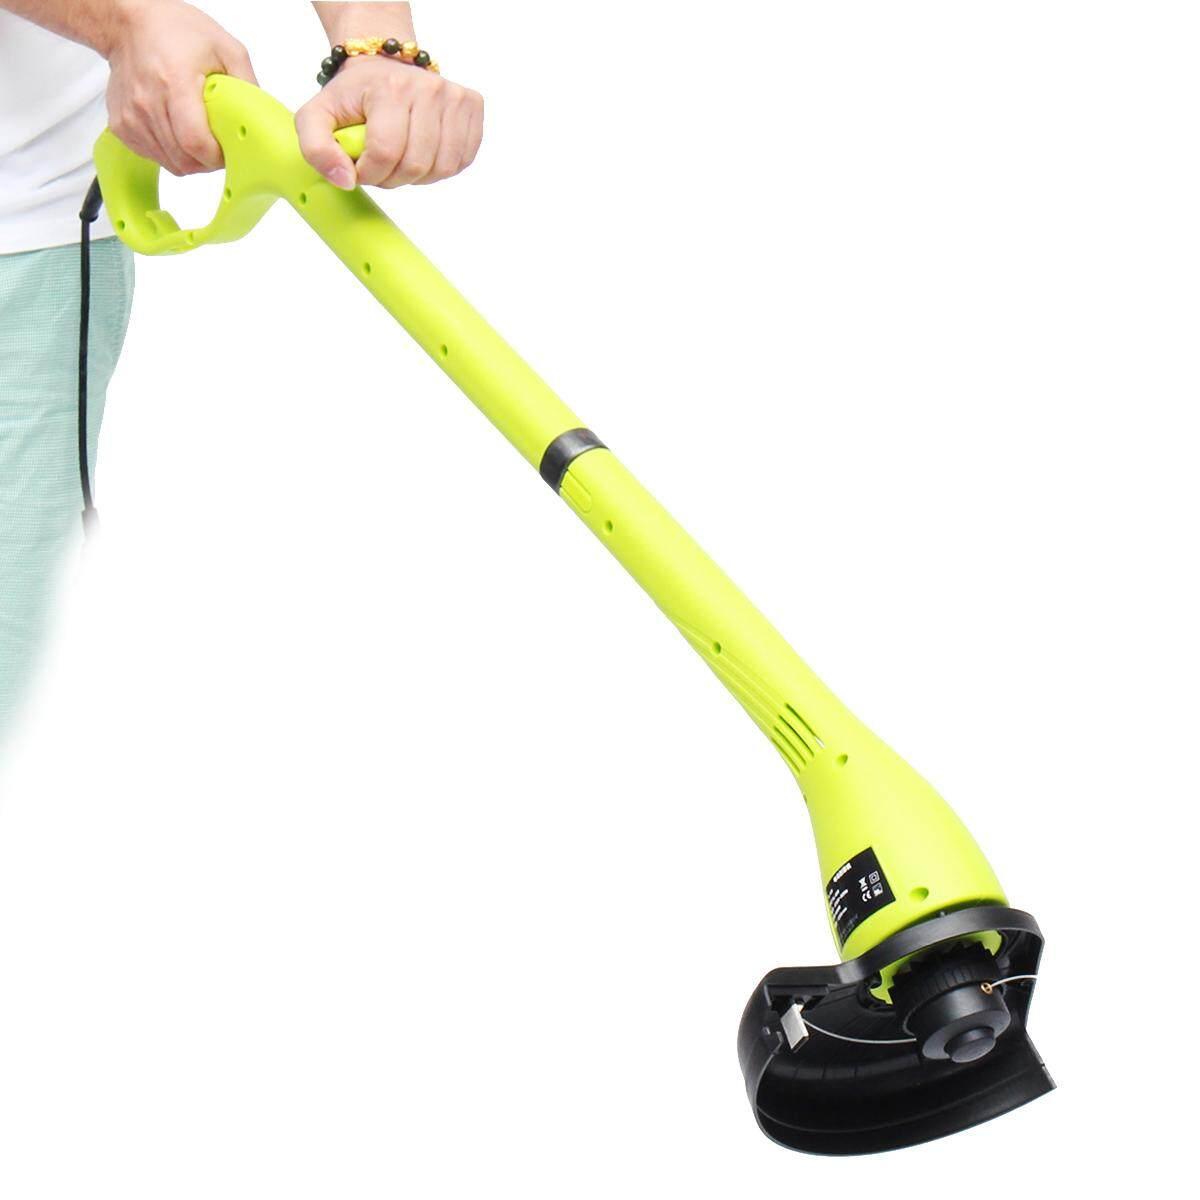 Plug-in electric lawn mower Lawn mower lawn mower garden home lawn mower lawn pruning machine